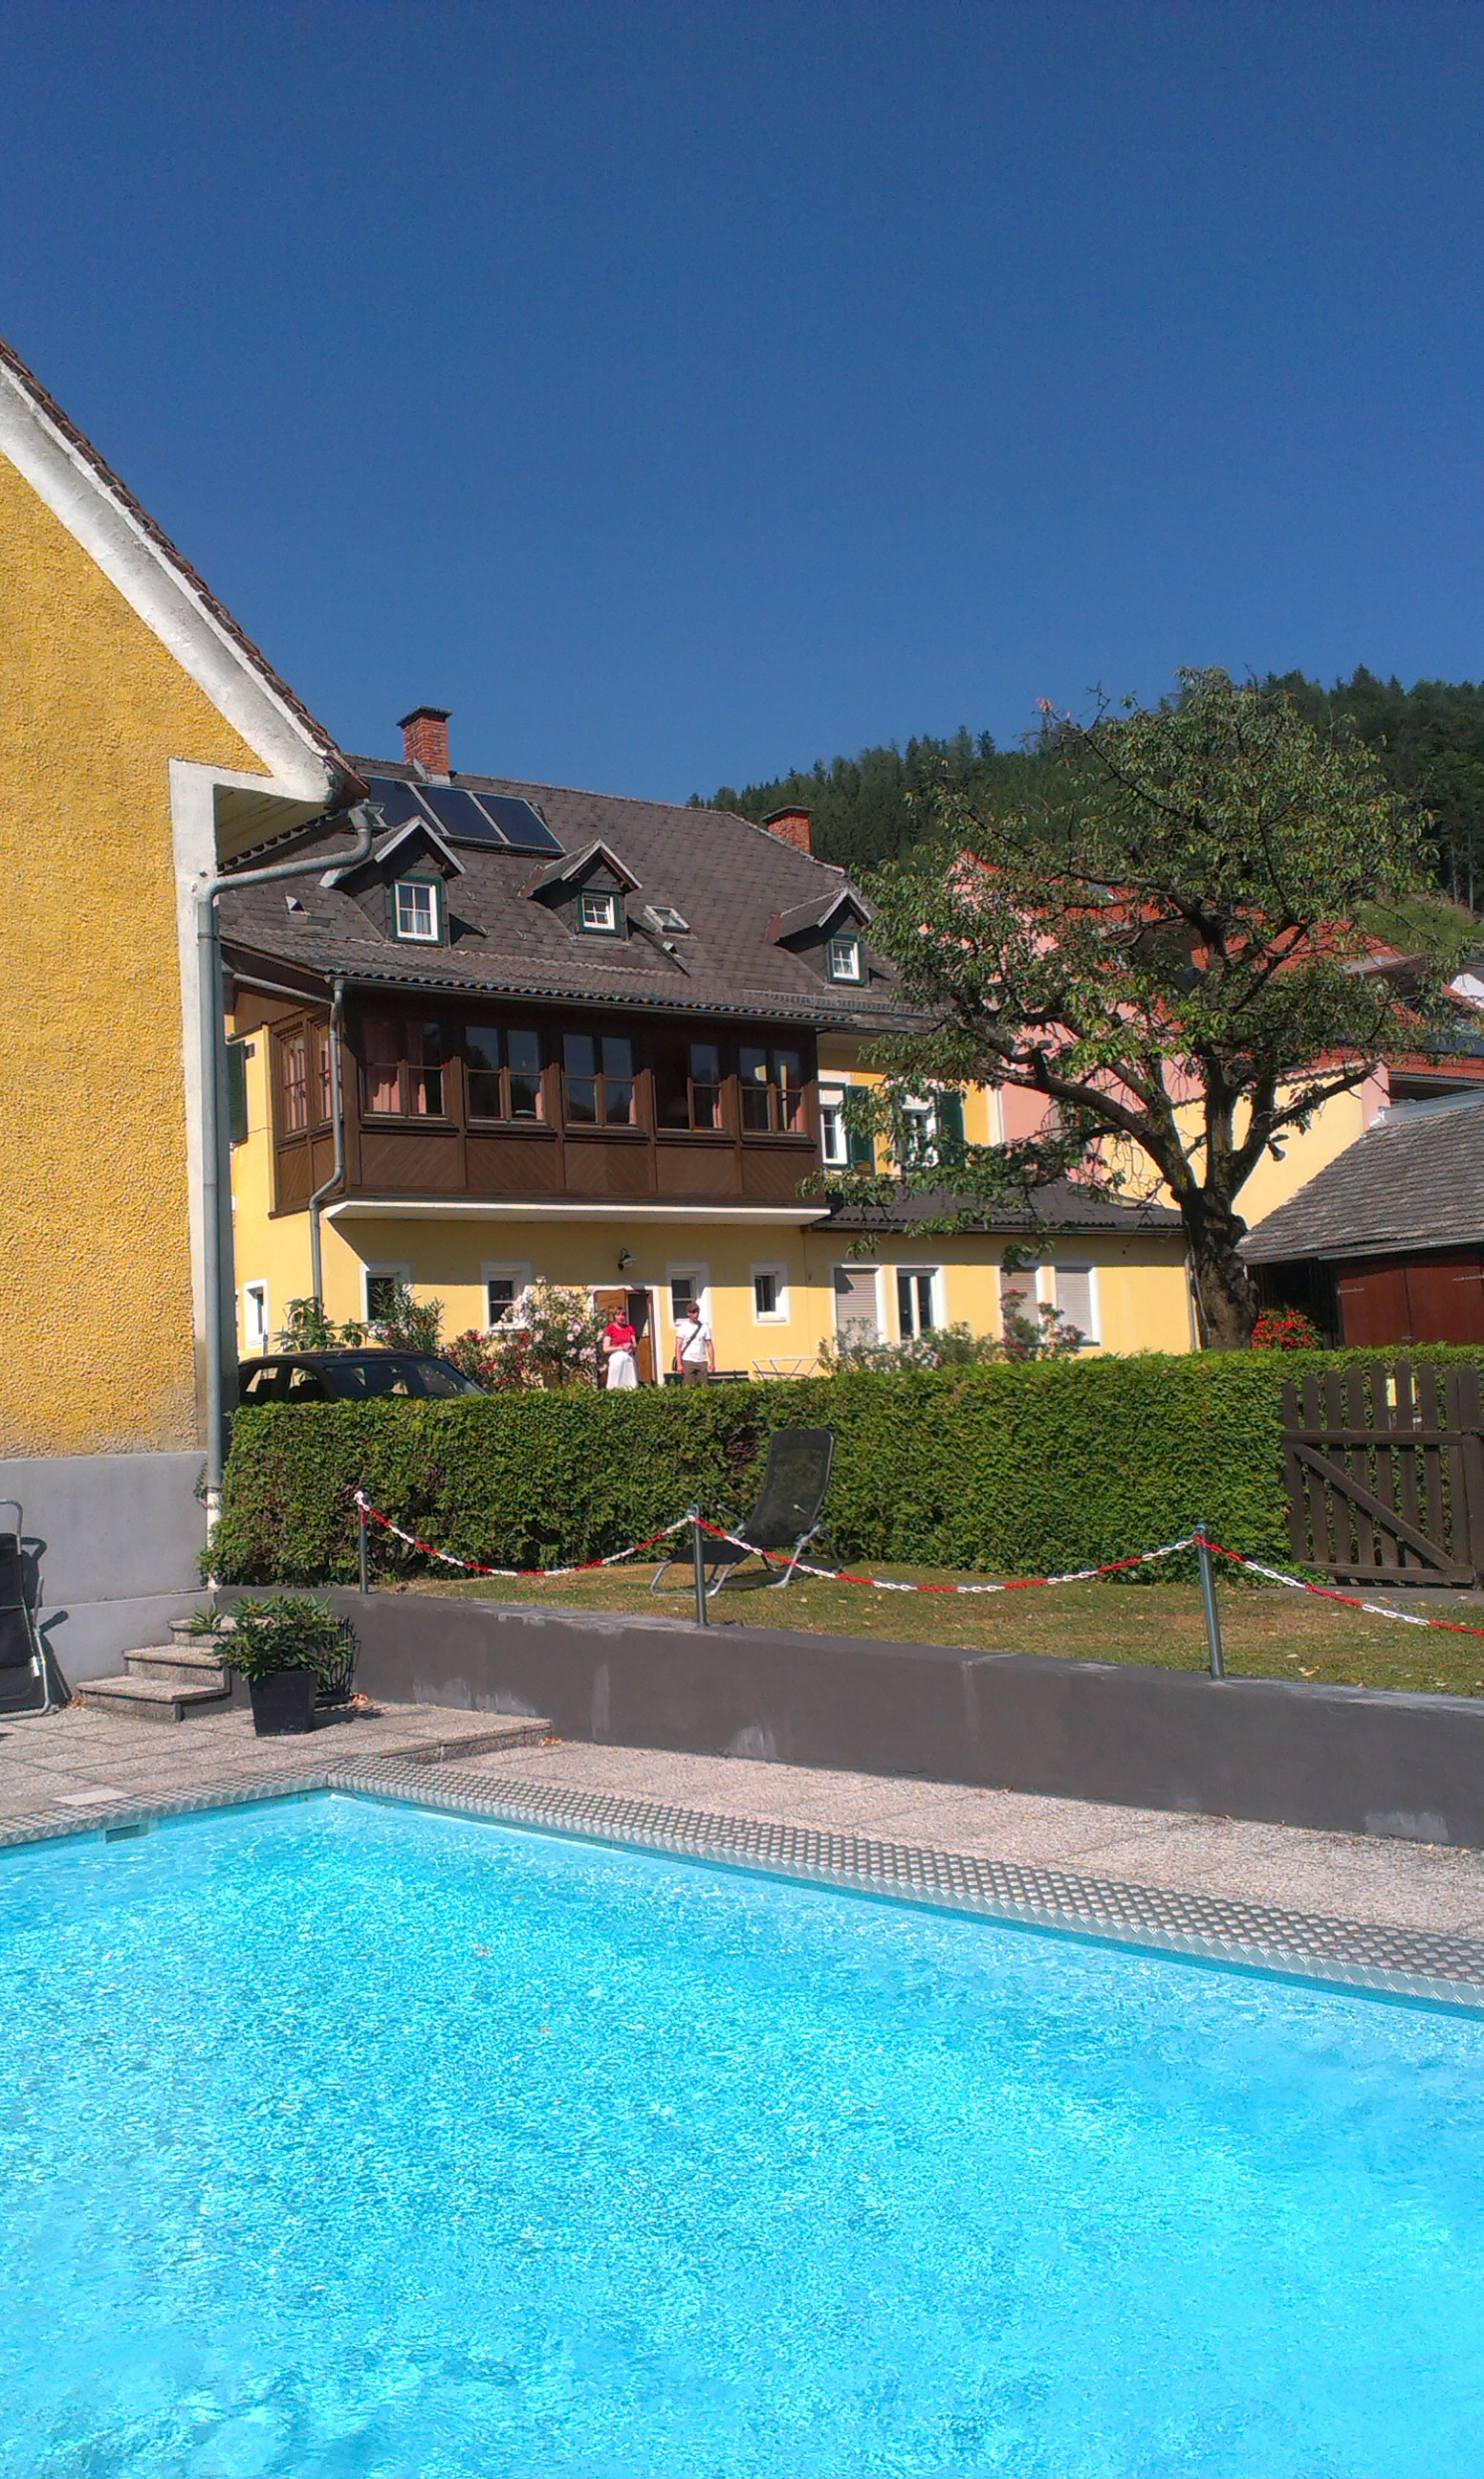 Gasthaus zur Sonne Pool